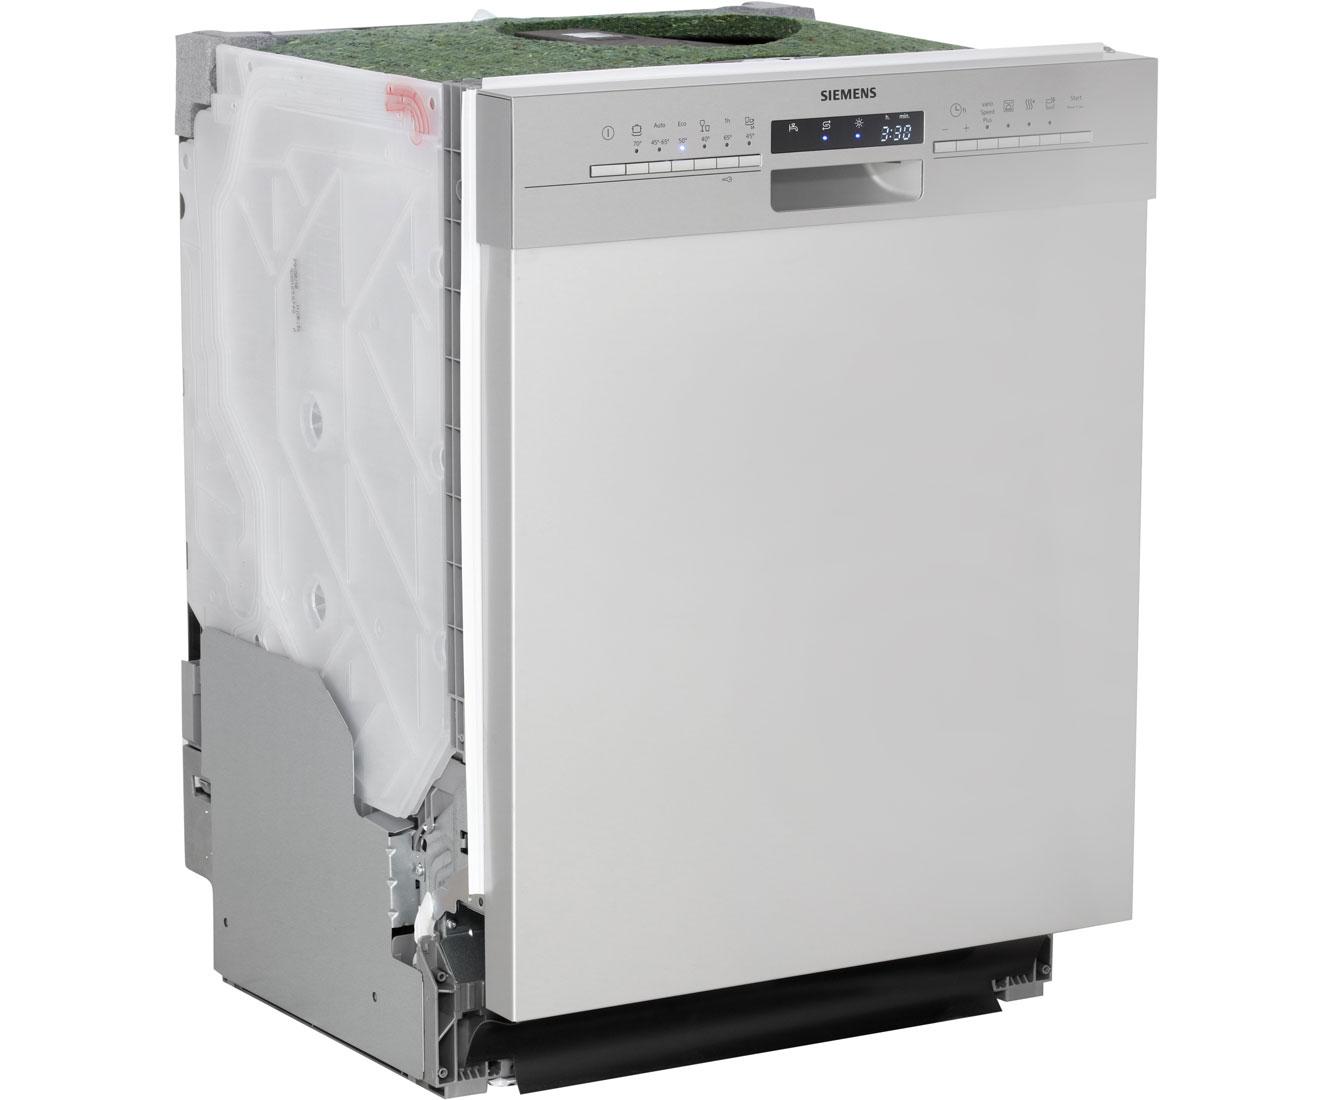 Aeg Kühlschrank Auffangbehälter Ausbauen : Siemens dunstabzugshaube motor ausbauen siemens lc ka